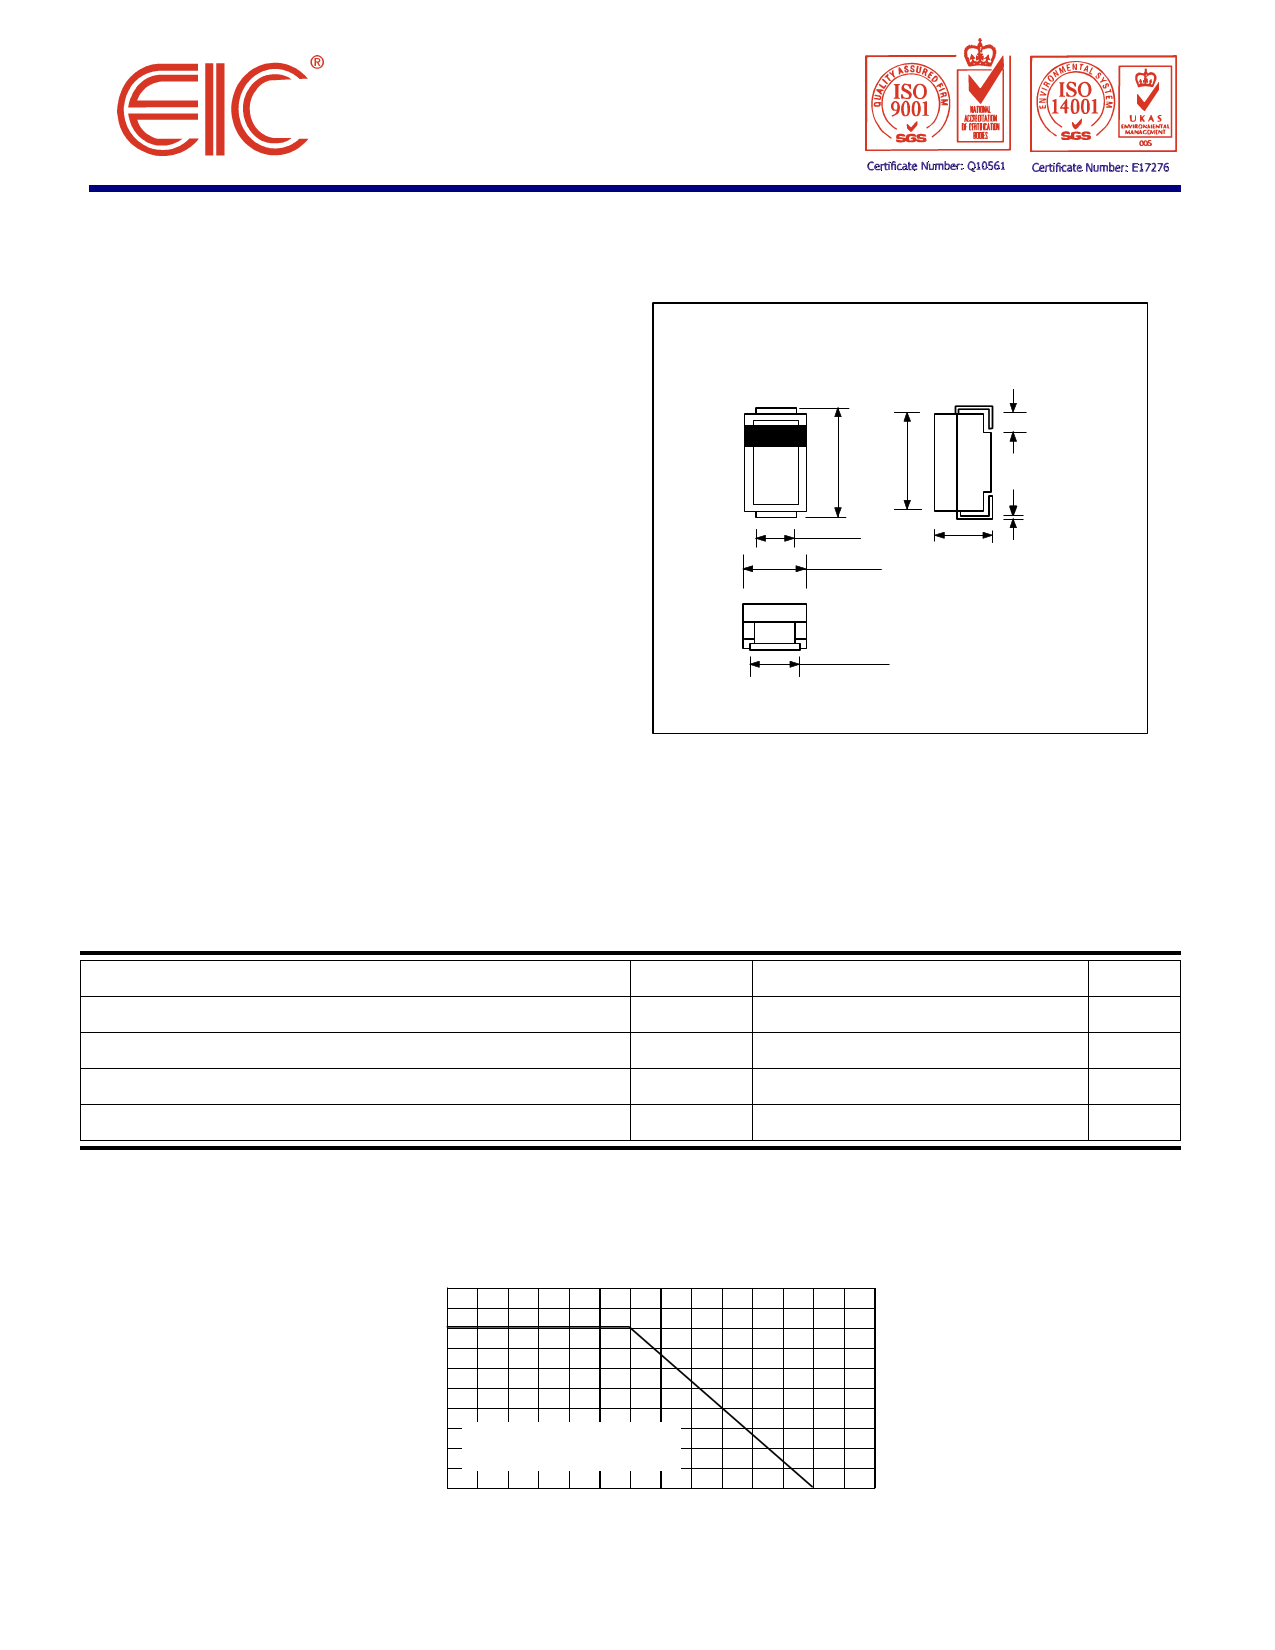 SZ40B0 datasheet, circuit